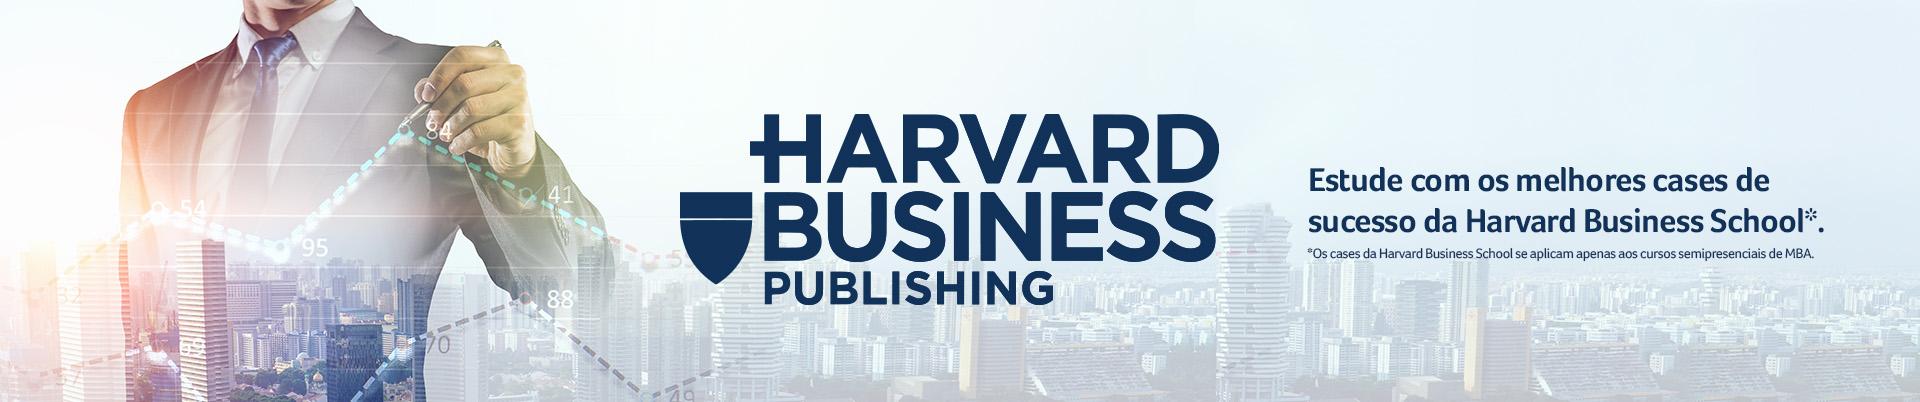 Banner Harvard